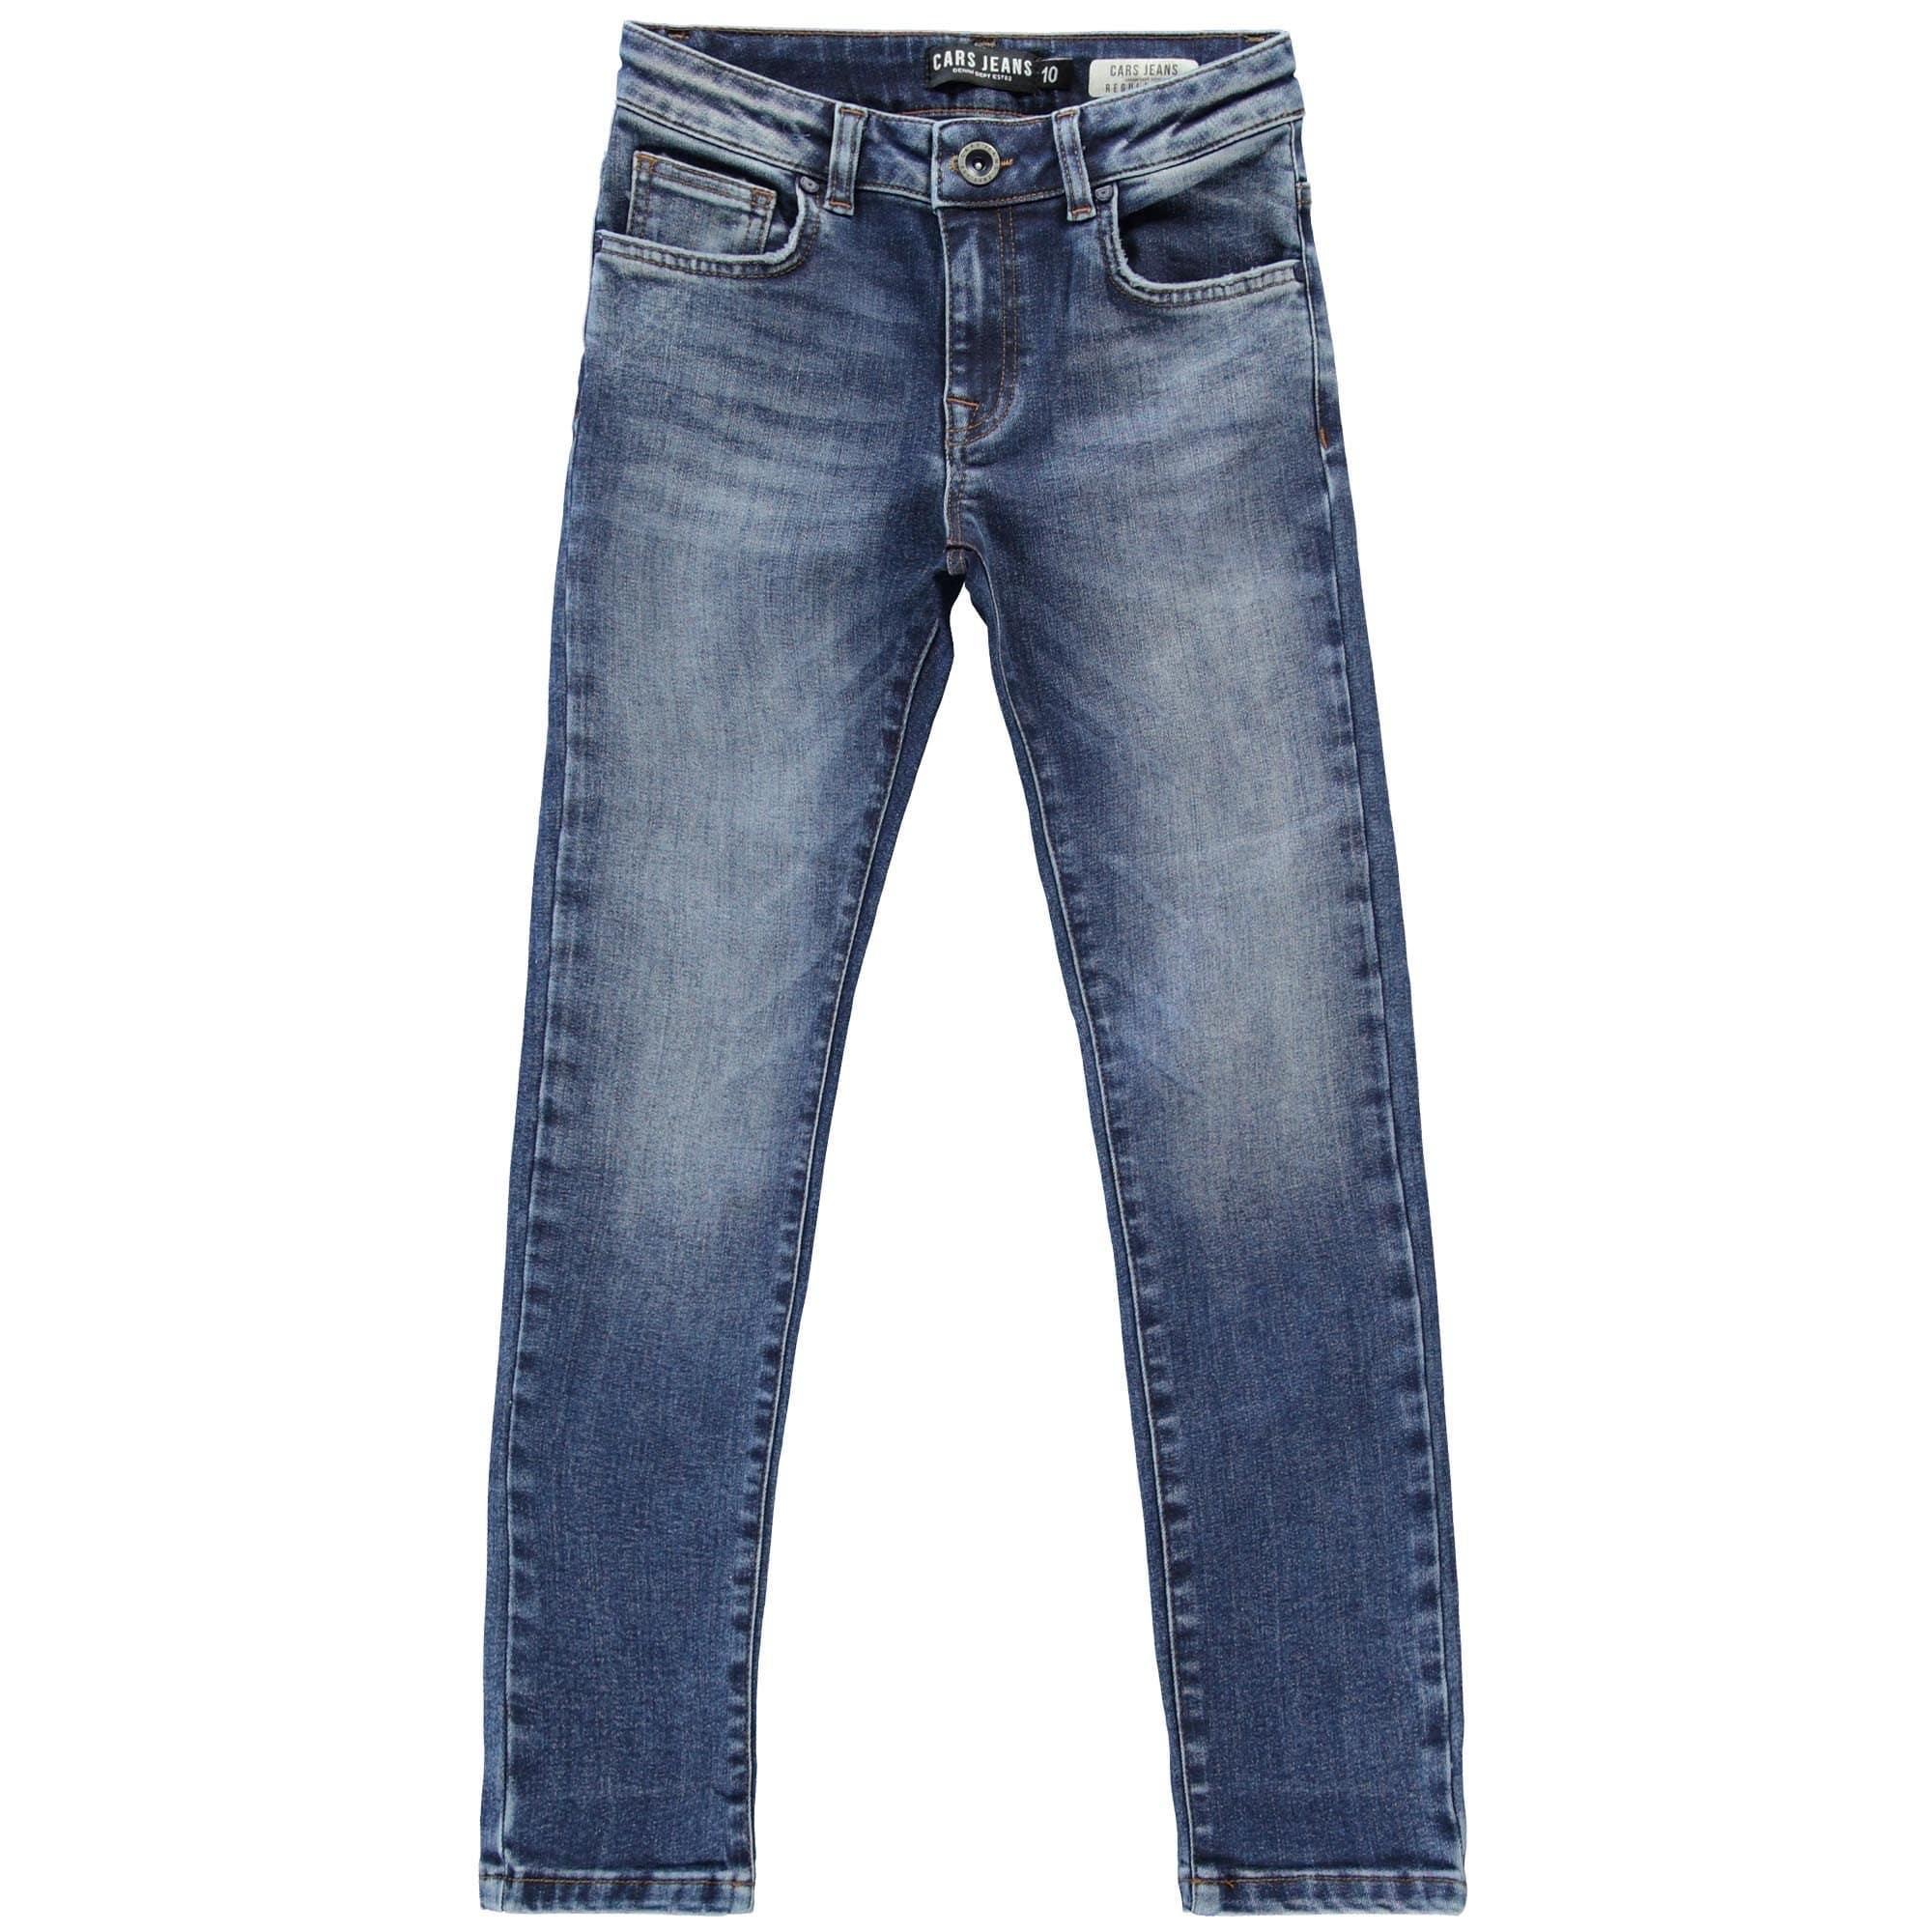 Cars Jeans Rooklyn Dark Used